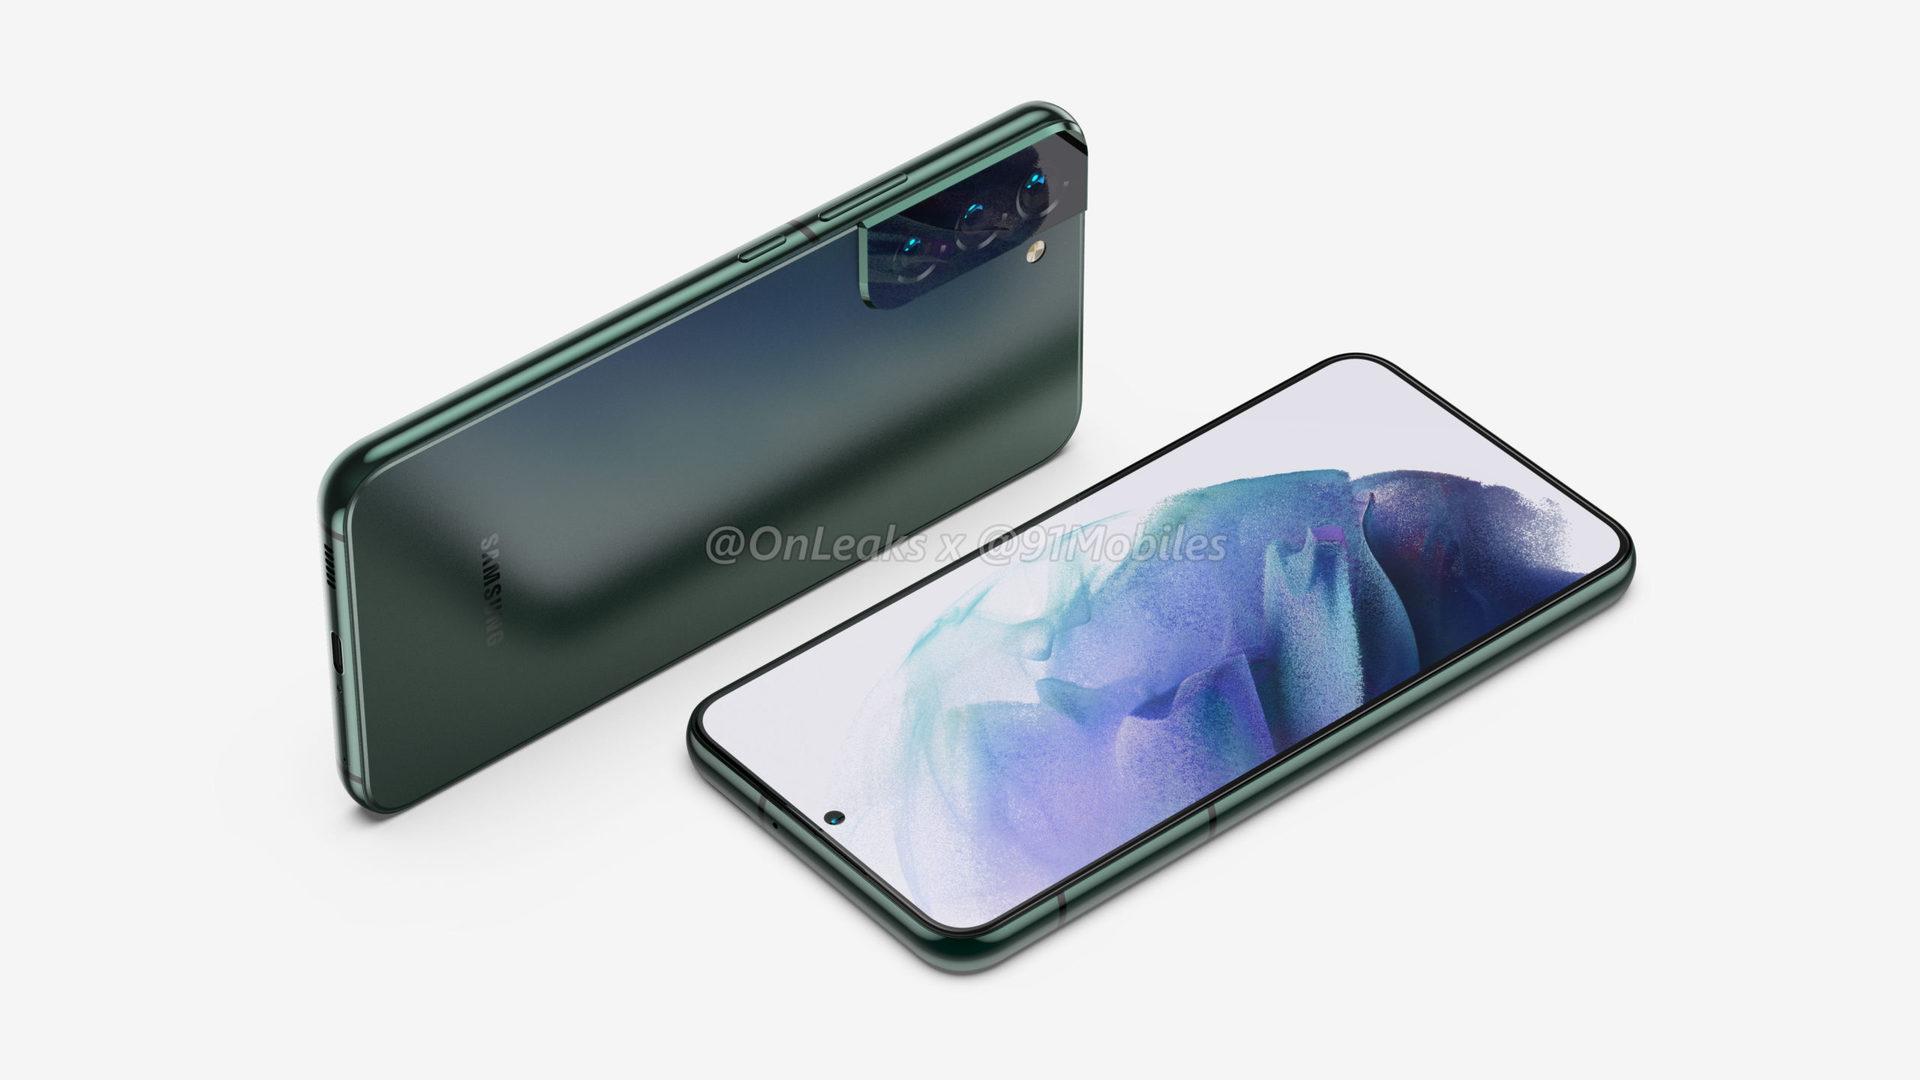 Samsung Galaxy S22 Plus 91mobiles onleaks